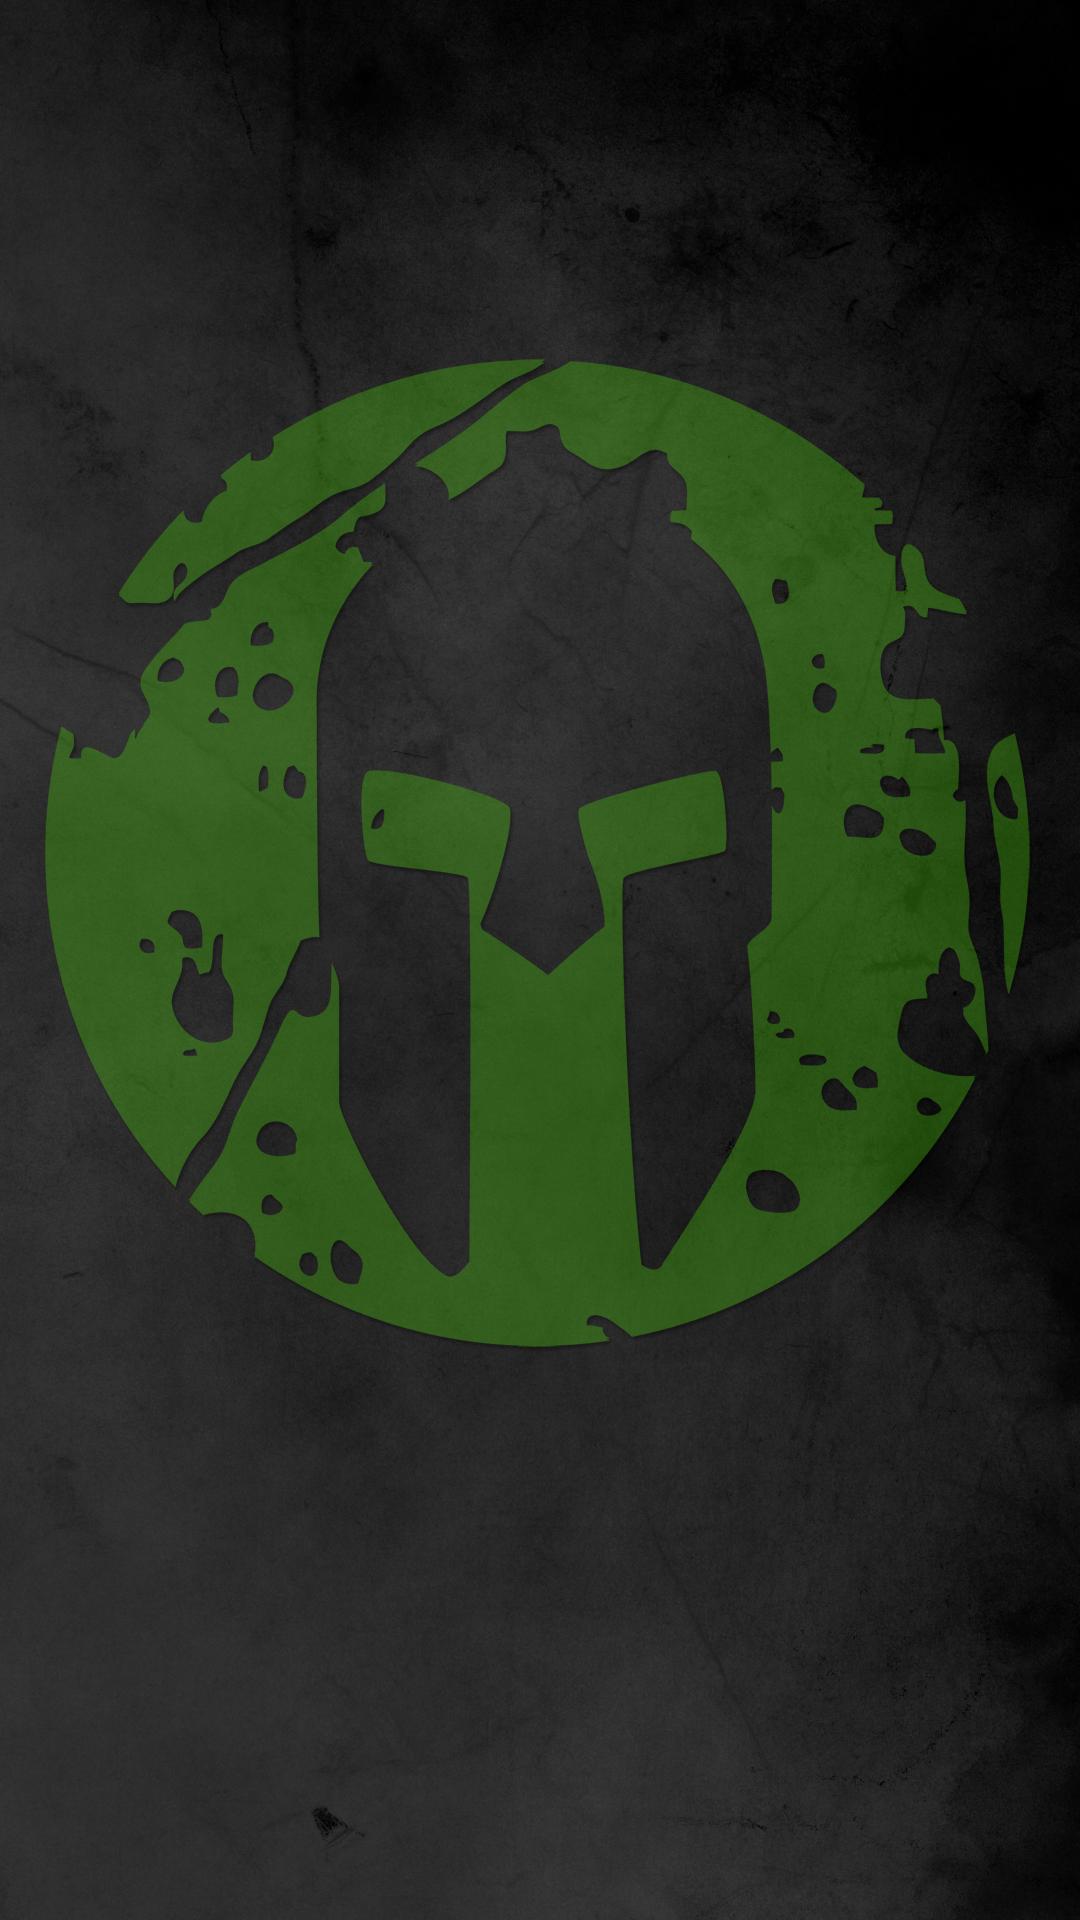 Spartan Race iPhone 1080x1920